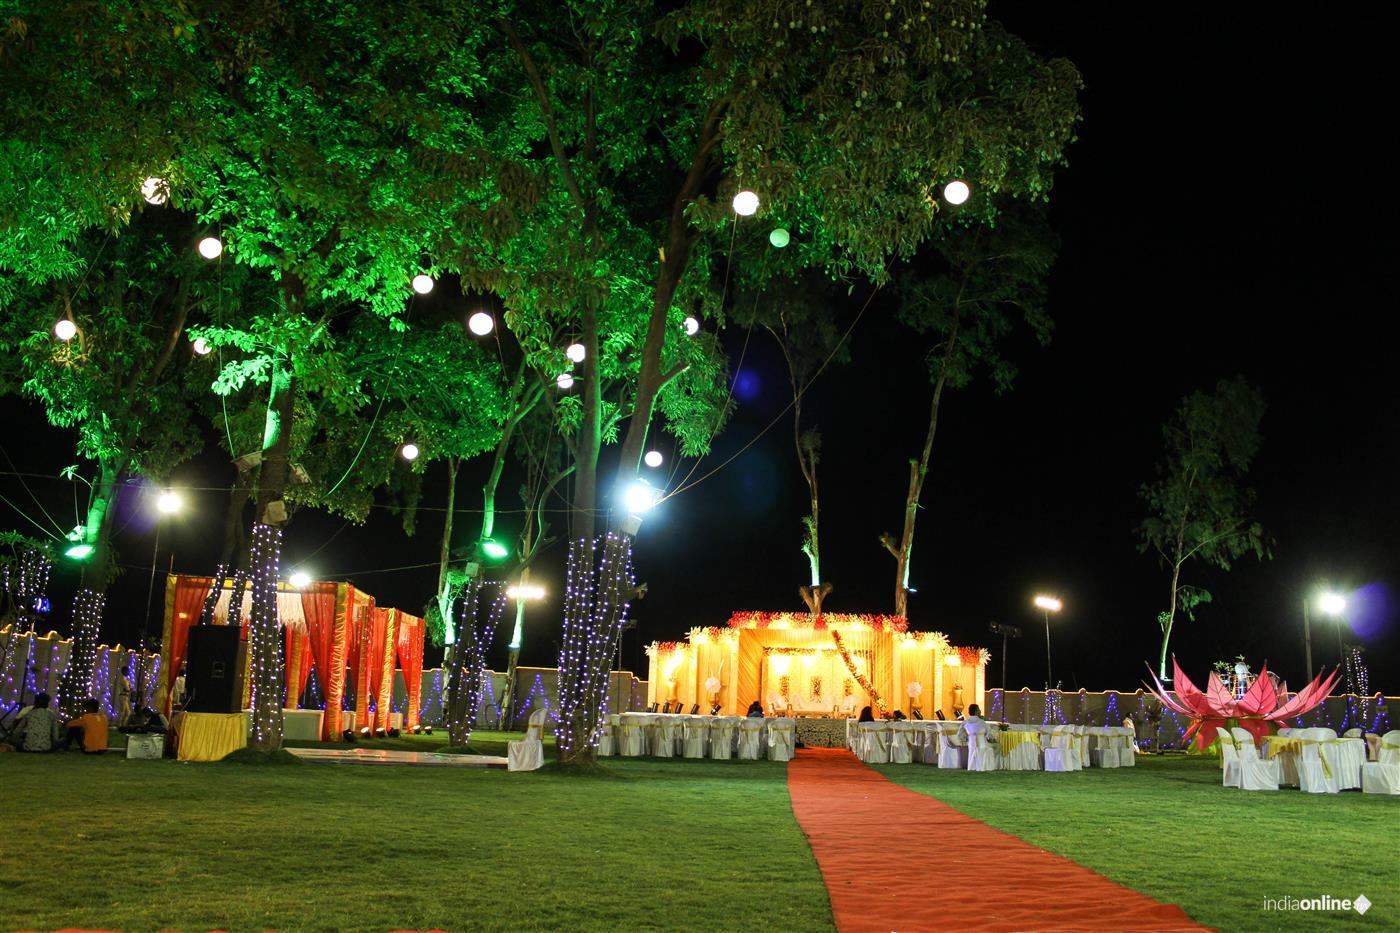 Marriage Garden in Misrod Bhopal by Utsav Marriage Garden - Photos ...